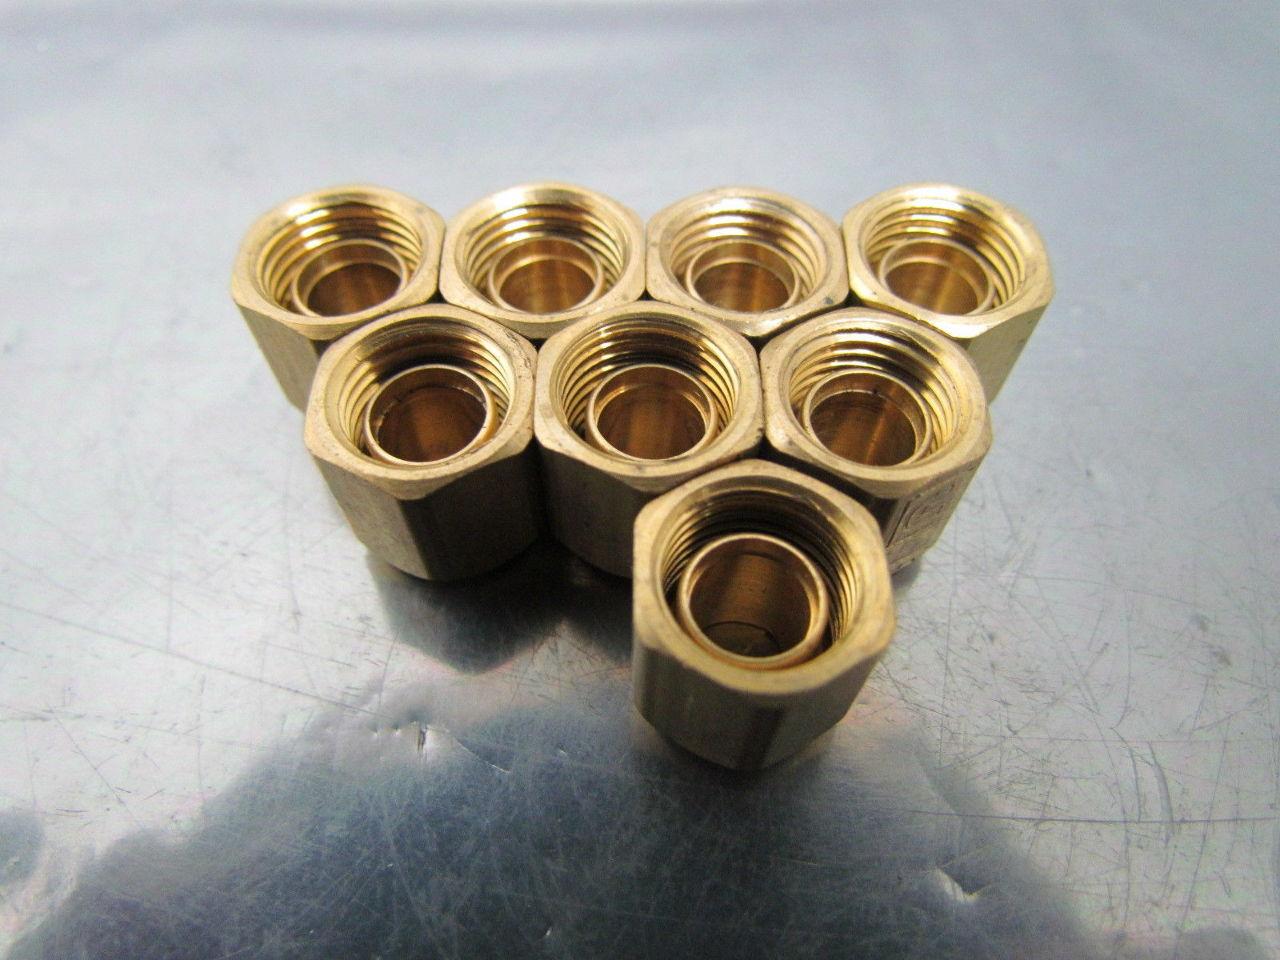 Parker xbtmb brass compression fitting nut and ferrule